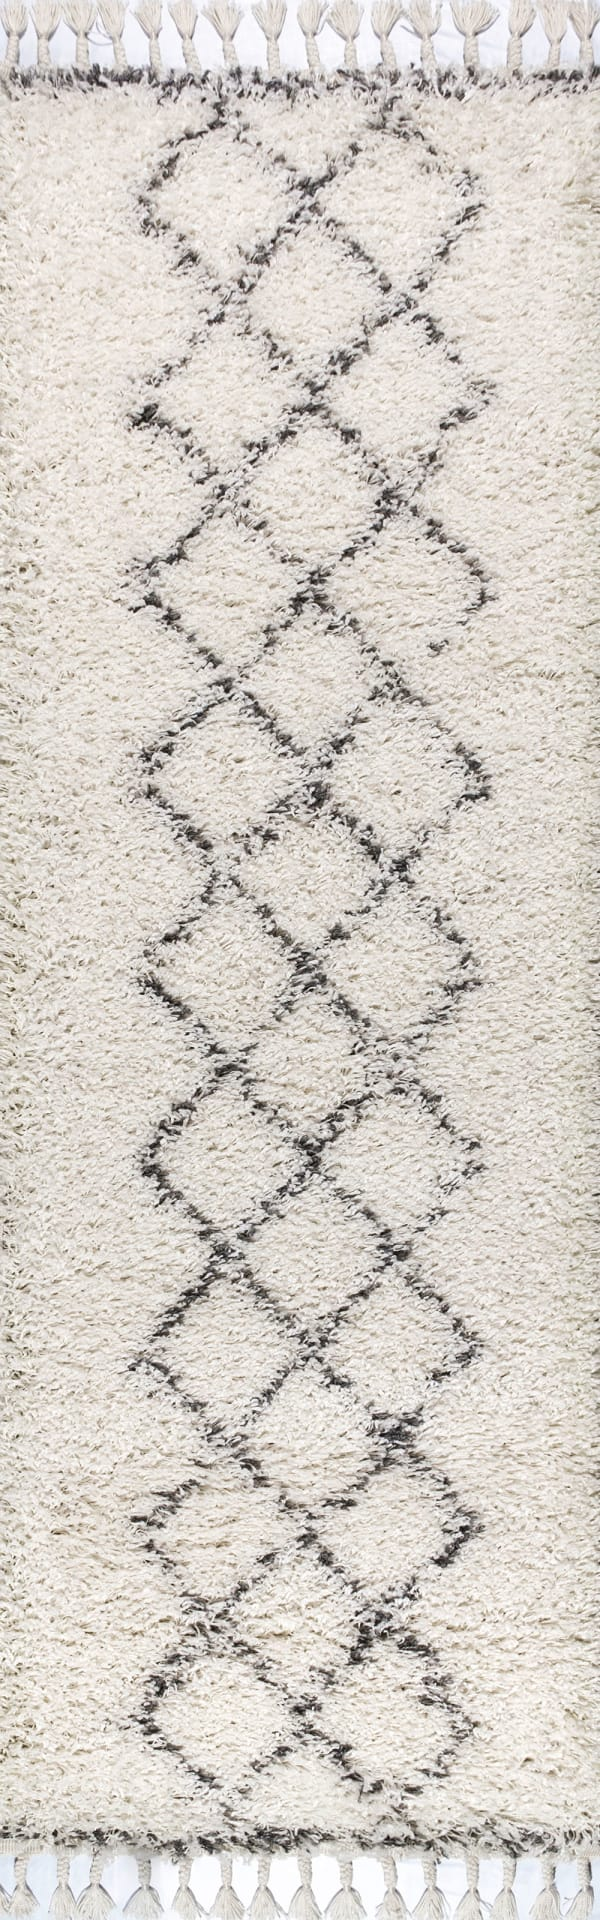 Shag Plush Tassel Moroccan Tribal Geometric Trellis Cream/Grey 2.25' x 8' Rectangular Runner Rug